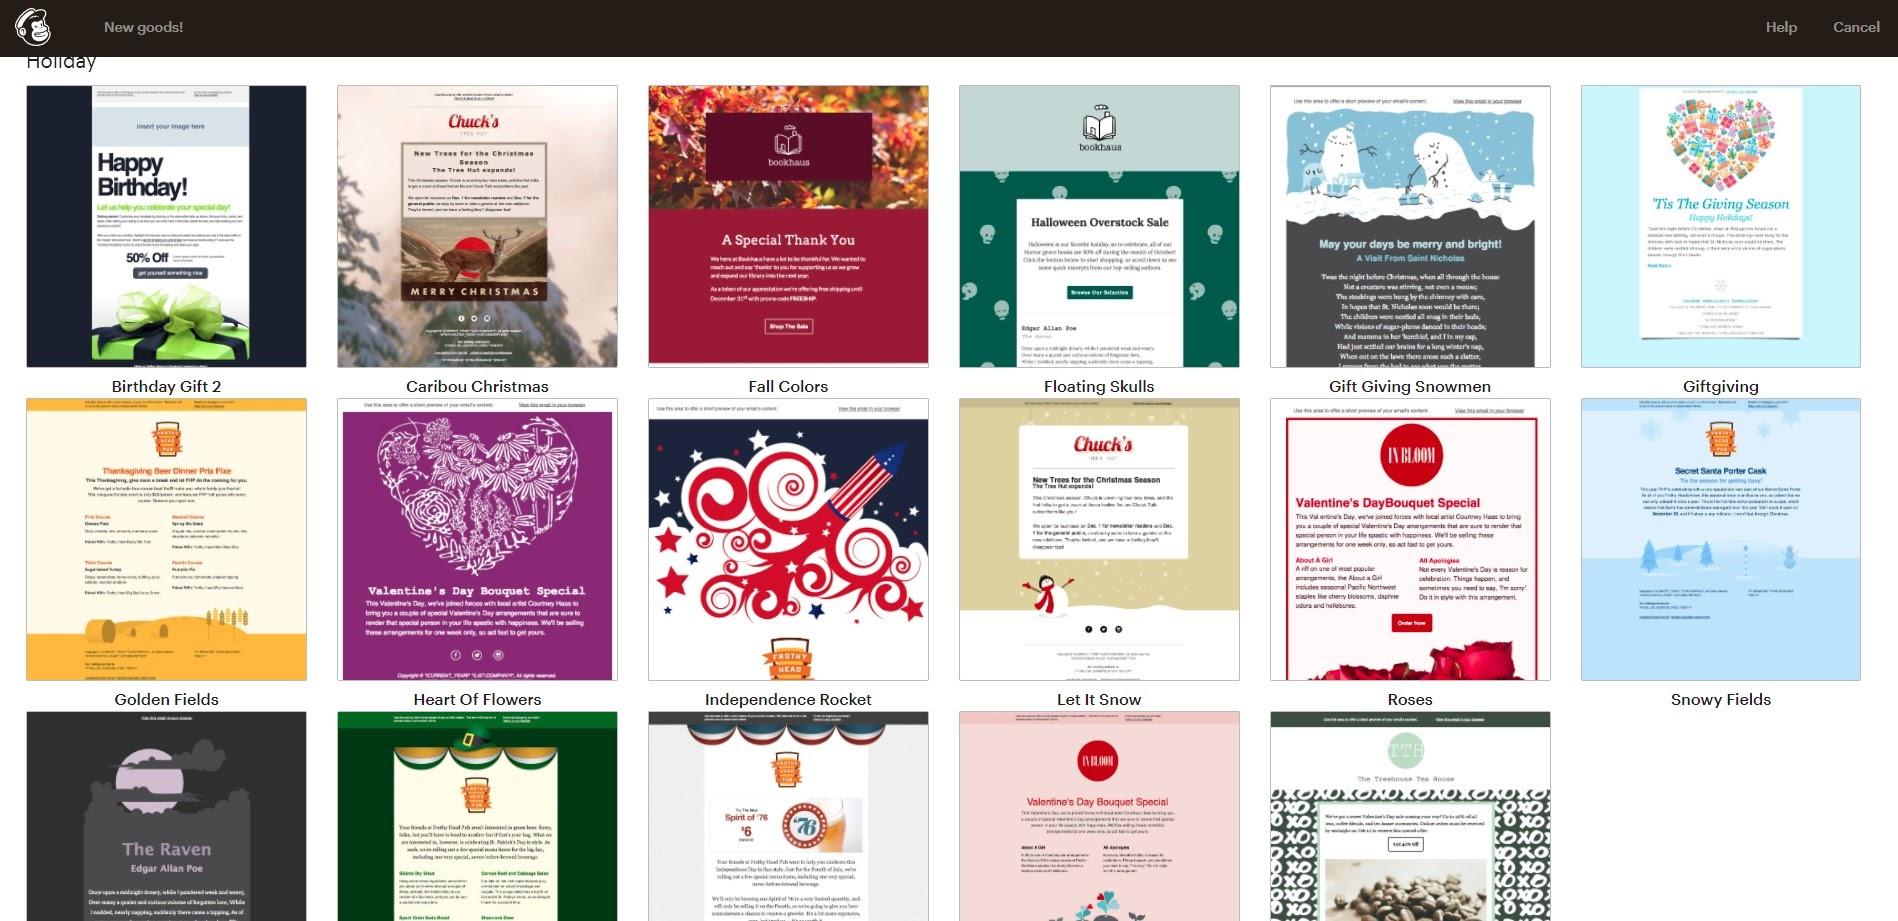 Mailchimp templates.